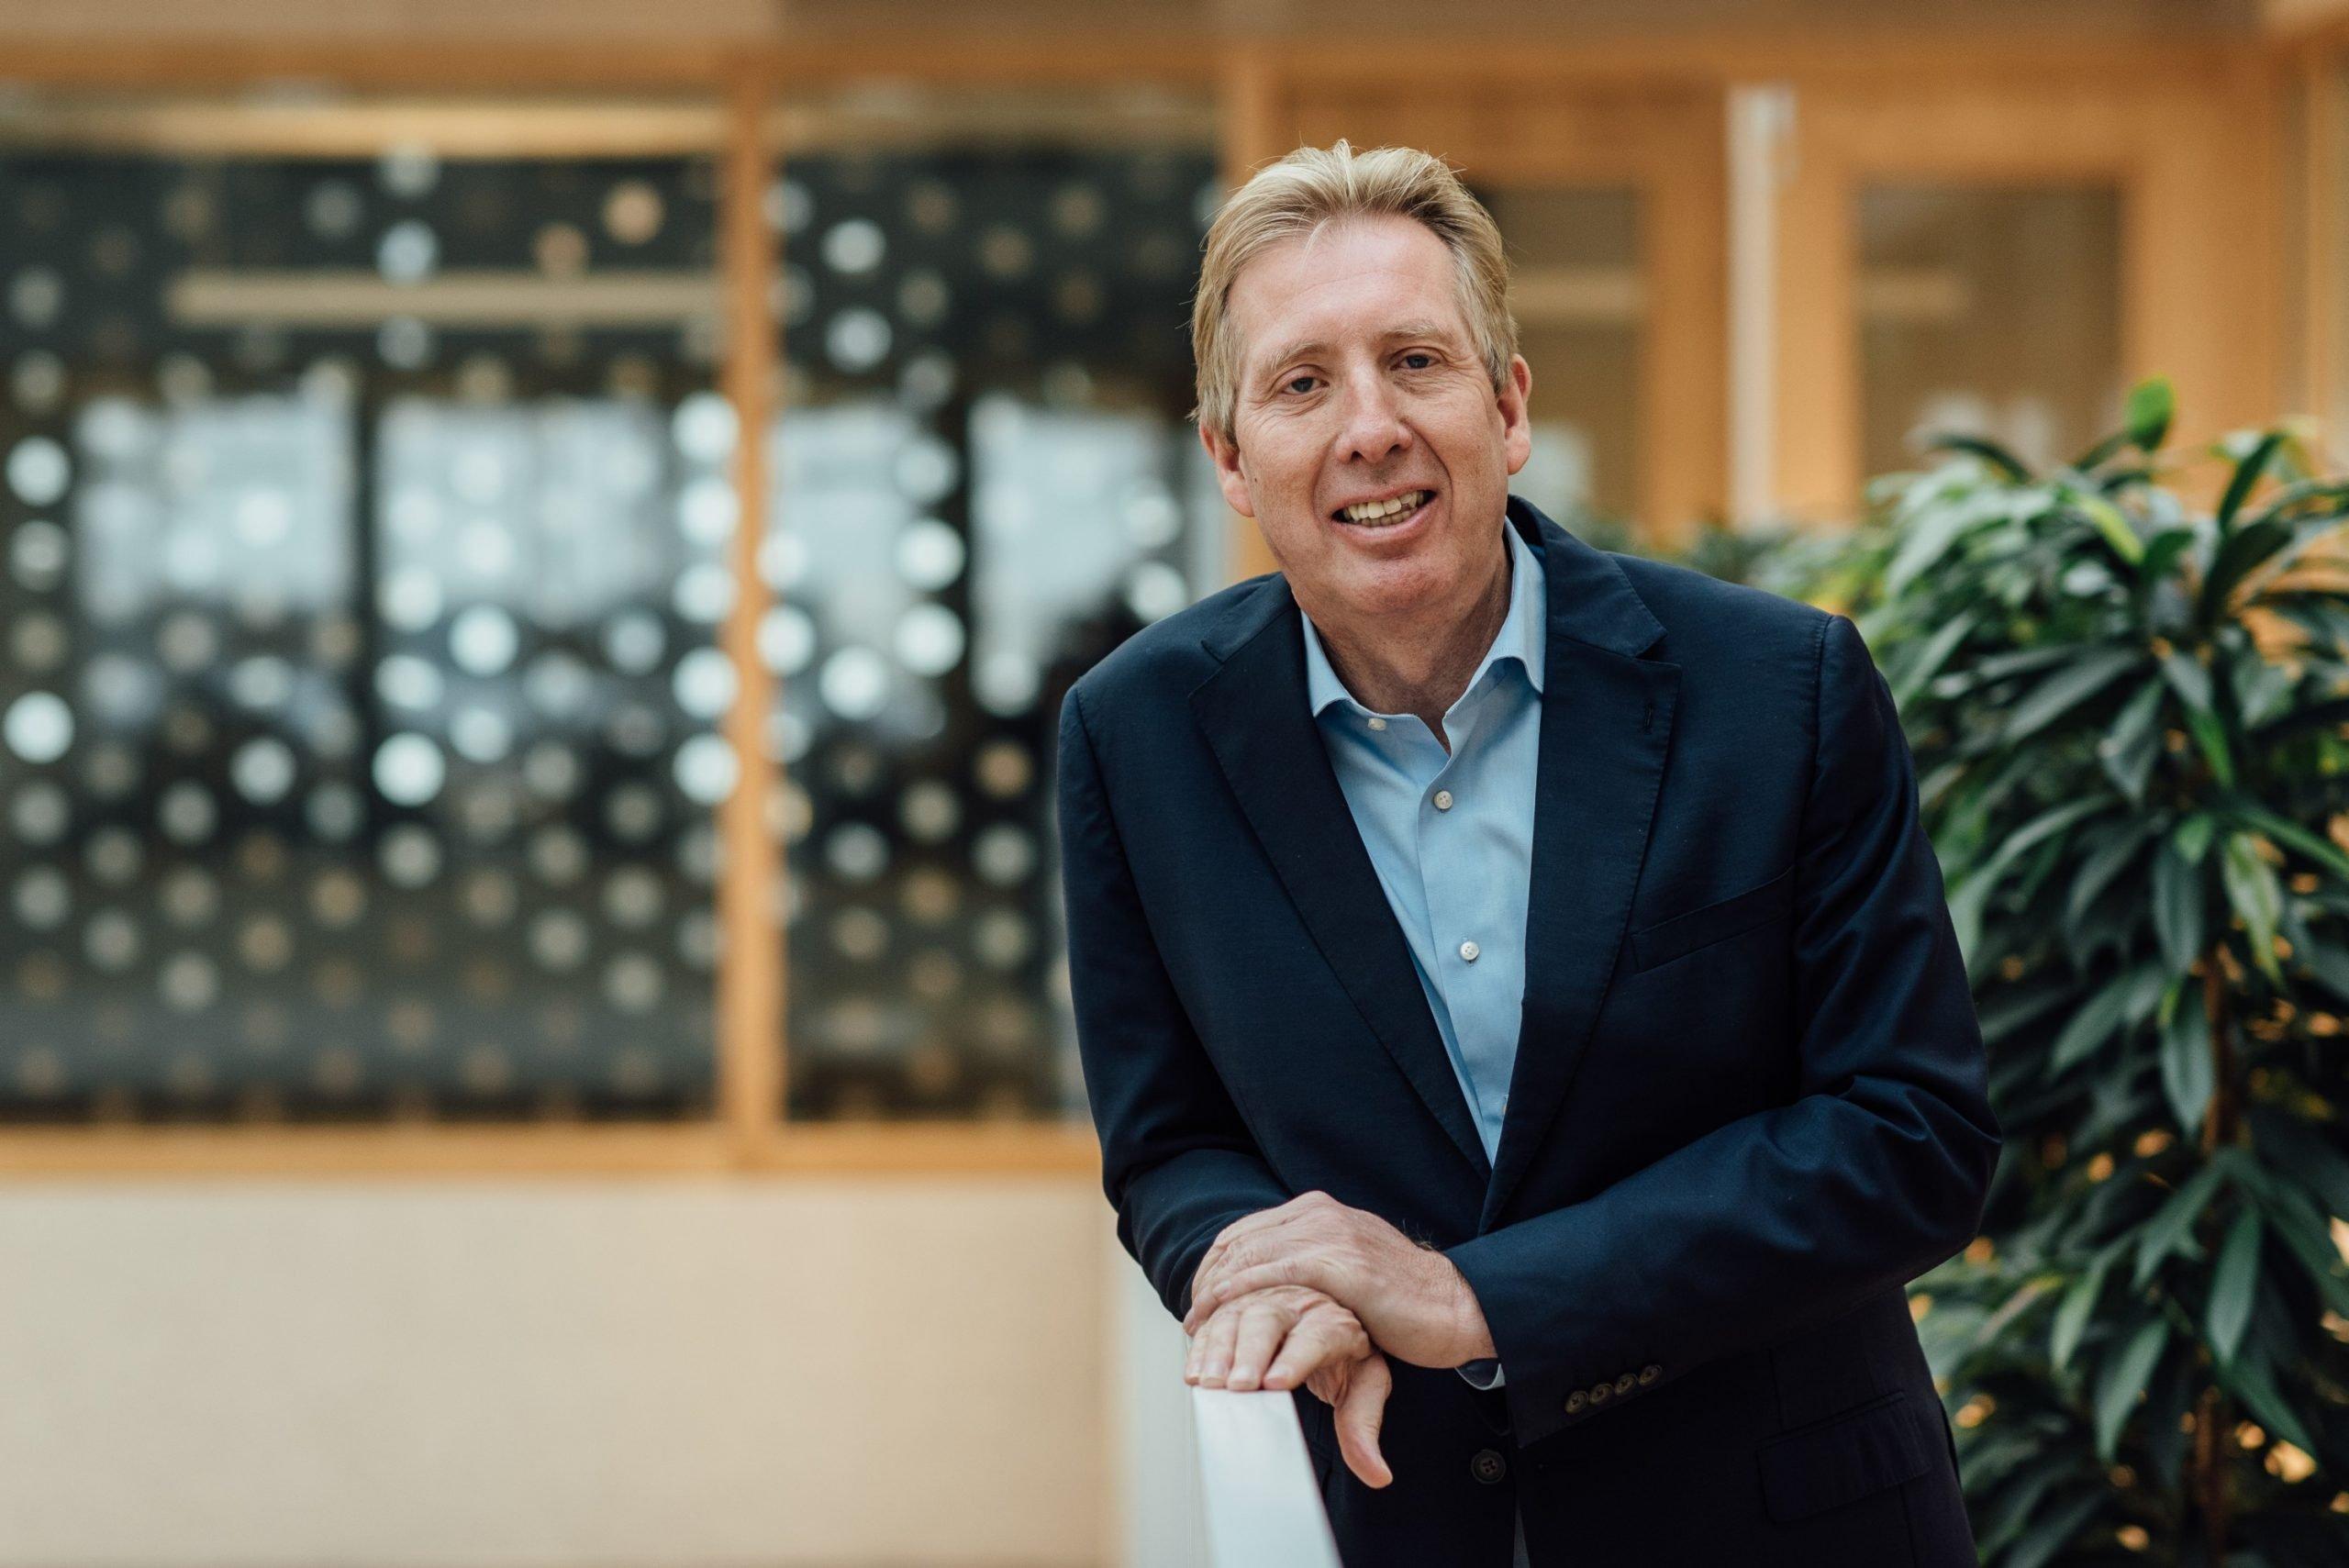 DRIFT medewerker Jan Rotmans